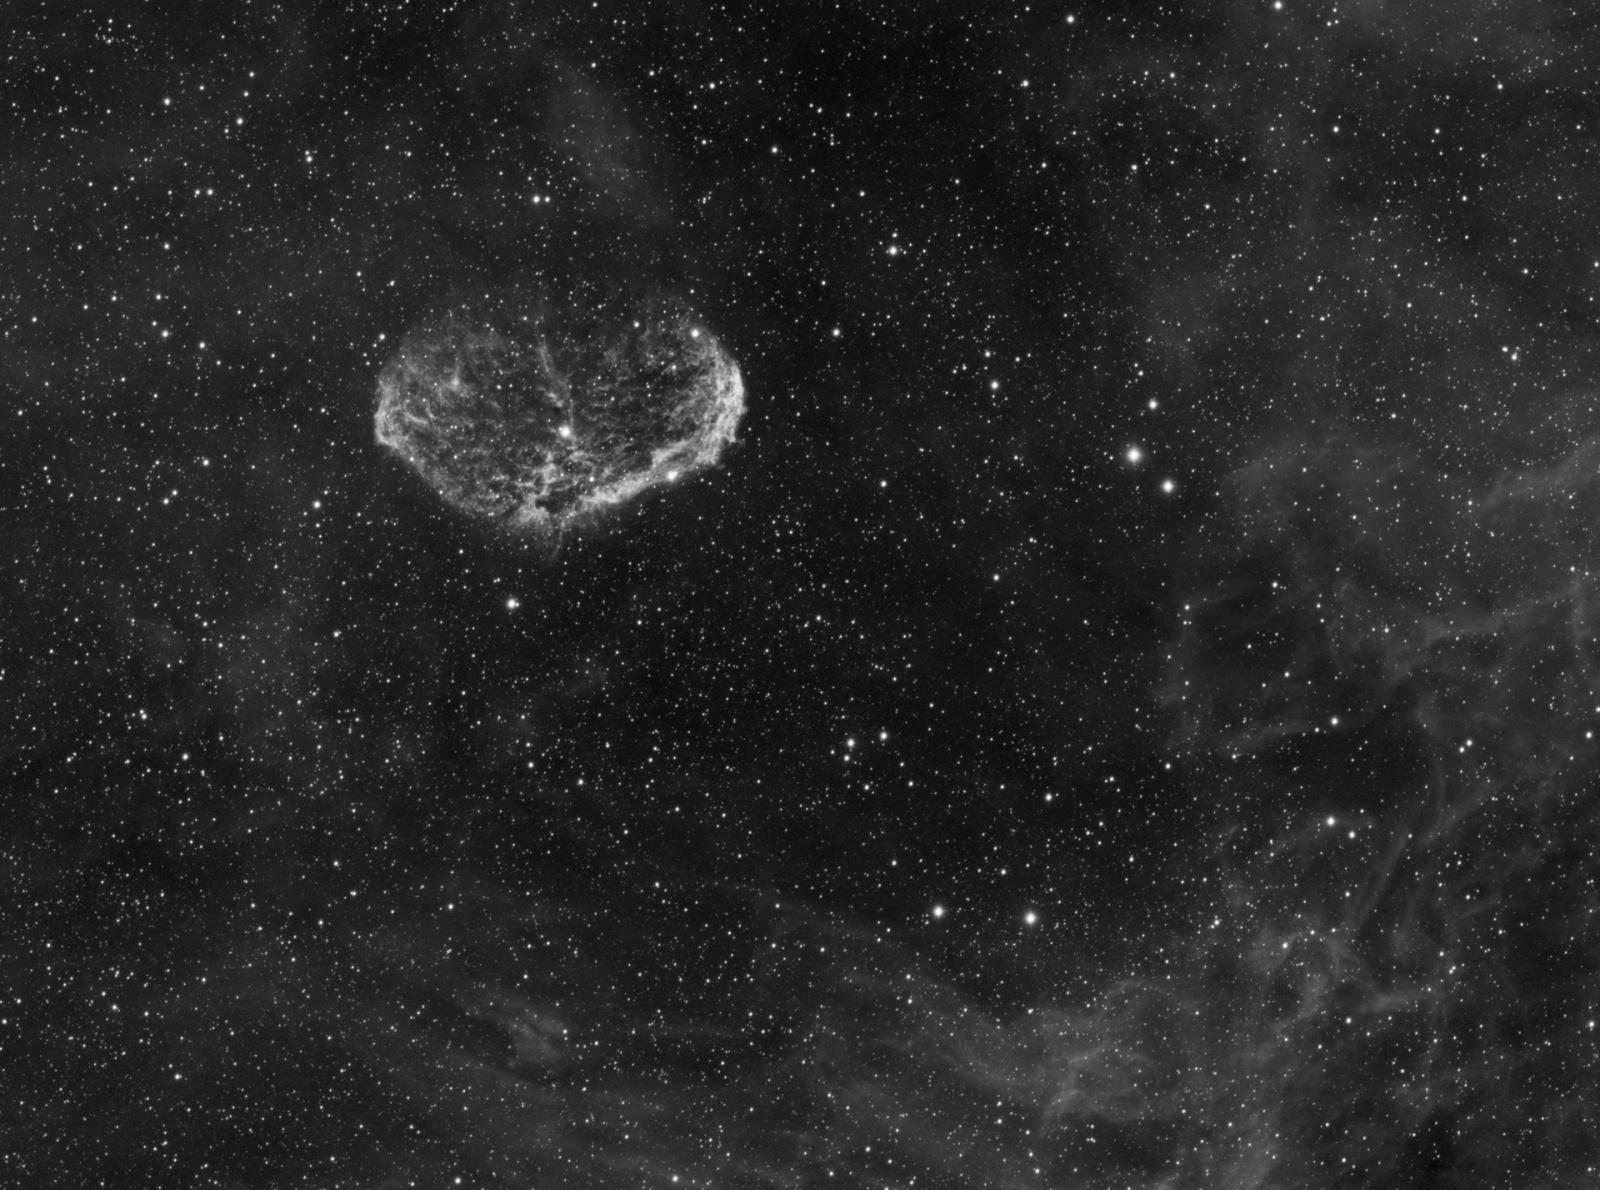 NGC6888_Ha_SC_HT_r_noise_HDR_Enh_FLAT_1920px.jpg